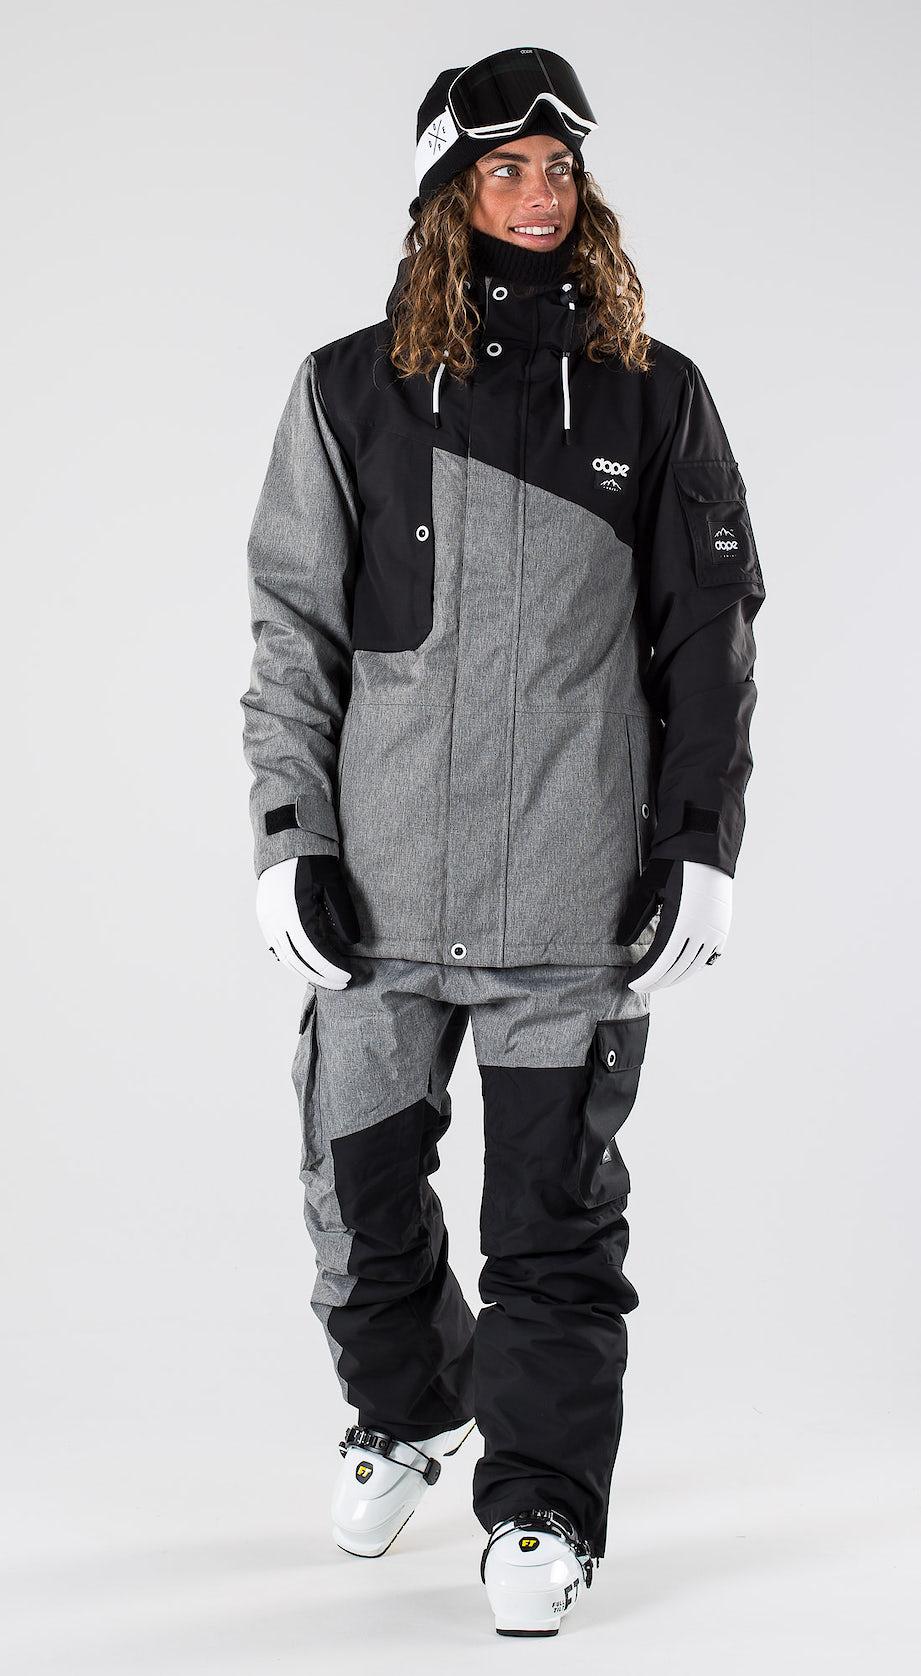 Dope Adept Black/Grey Melange Ski clothing Multi